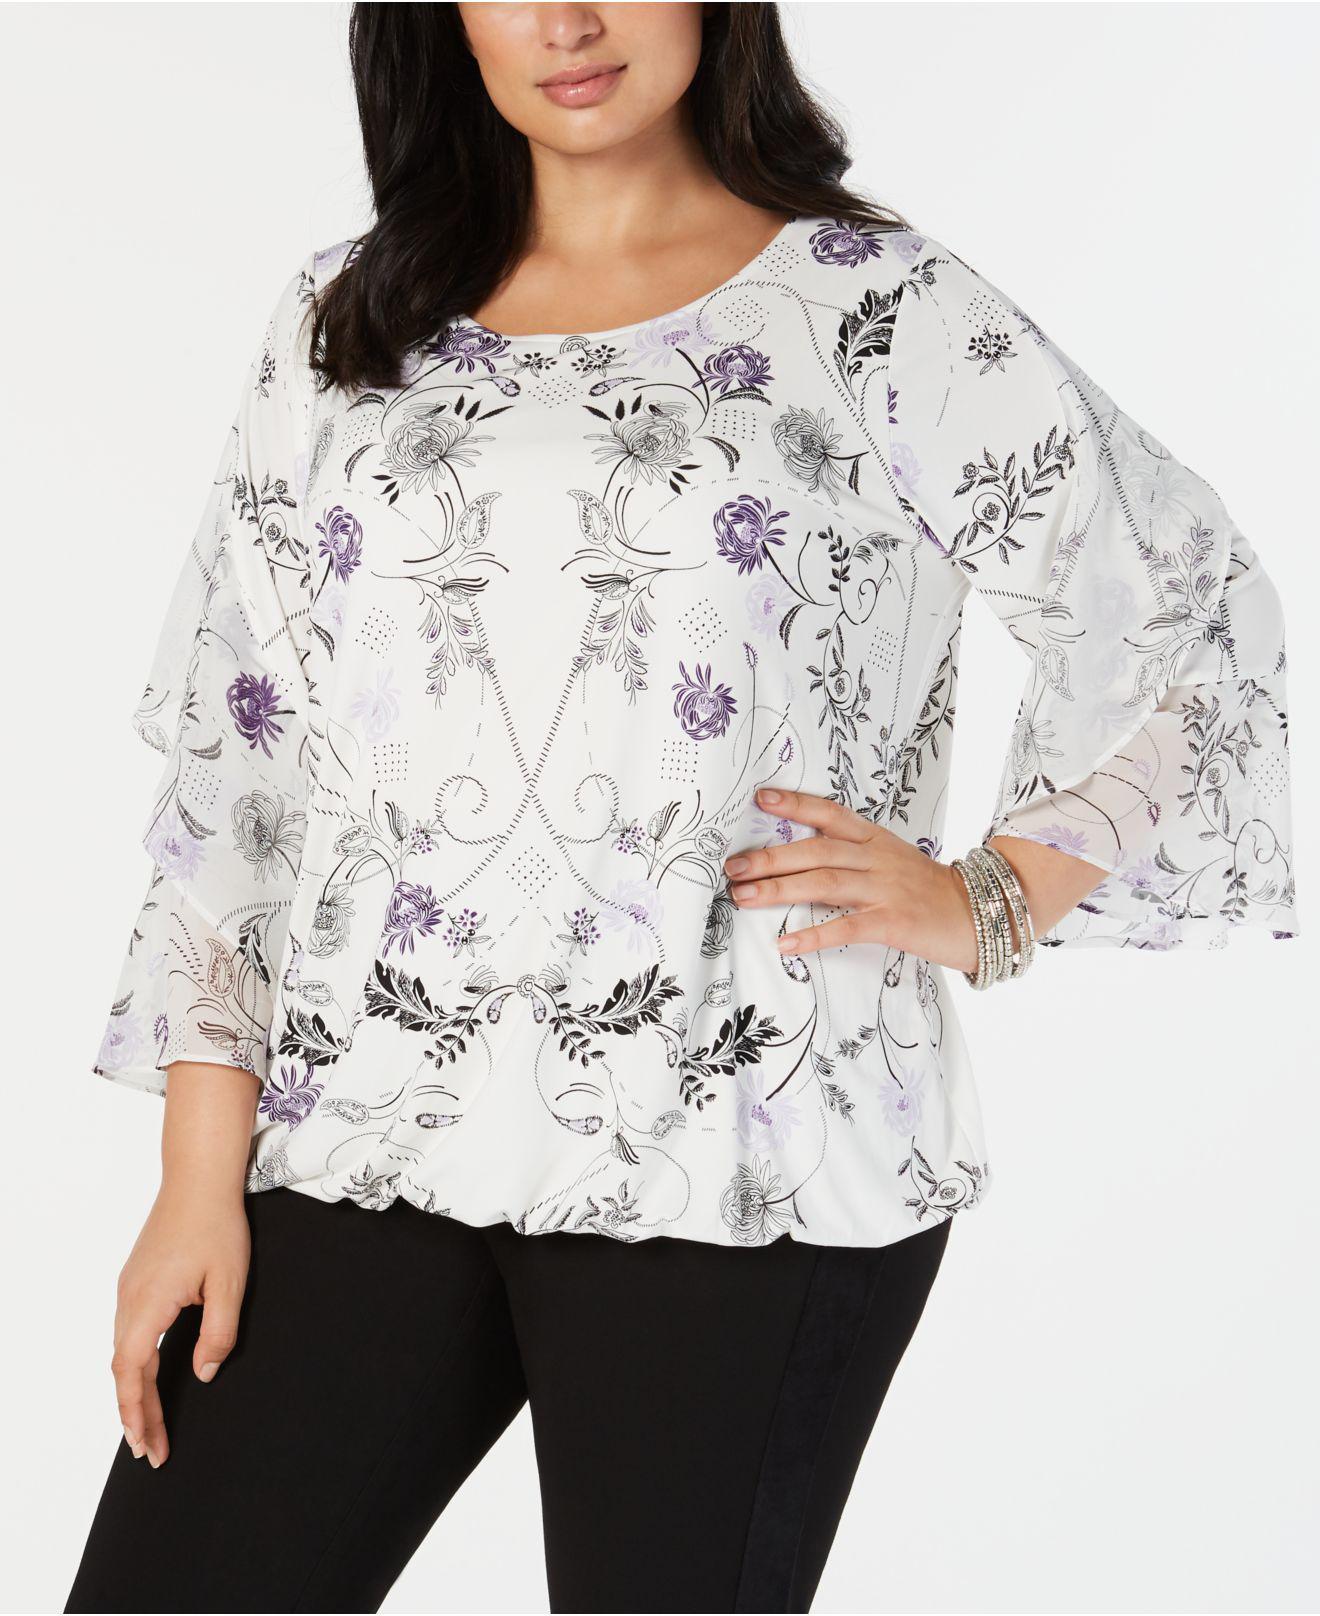 503ae7a2ef8 Alfani. Women s Plus Size Ruffled-sleeve Top ...